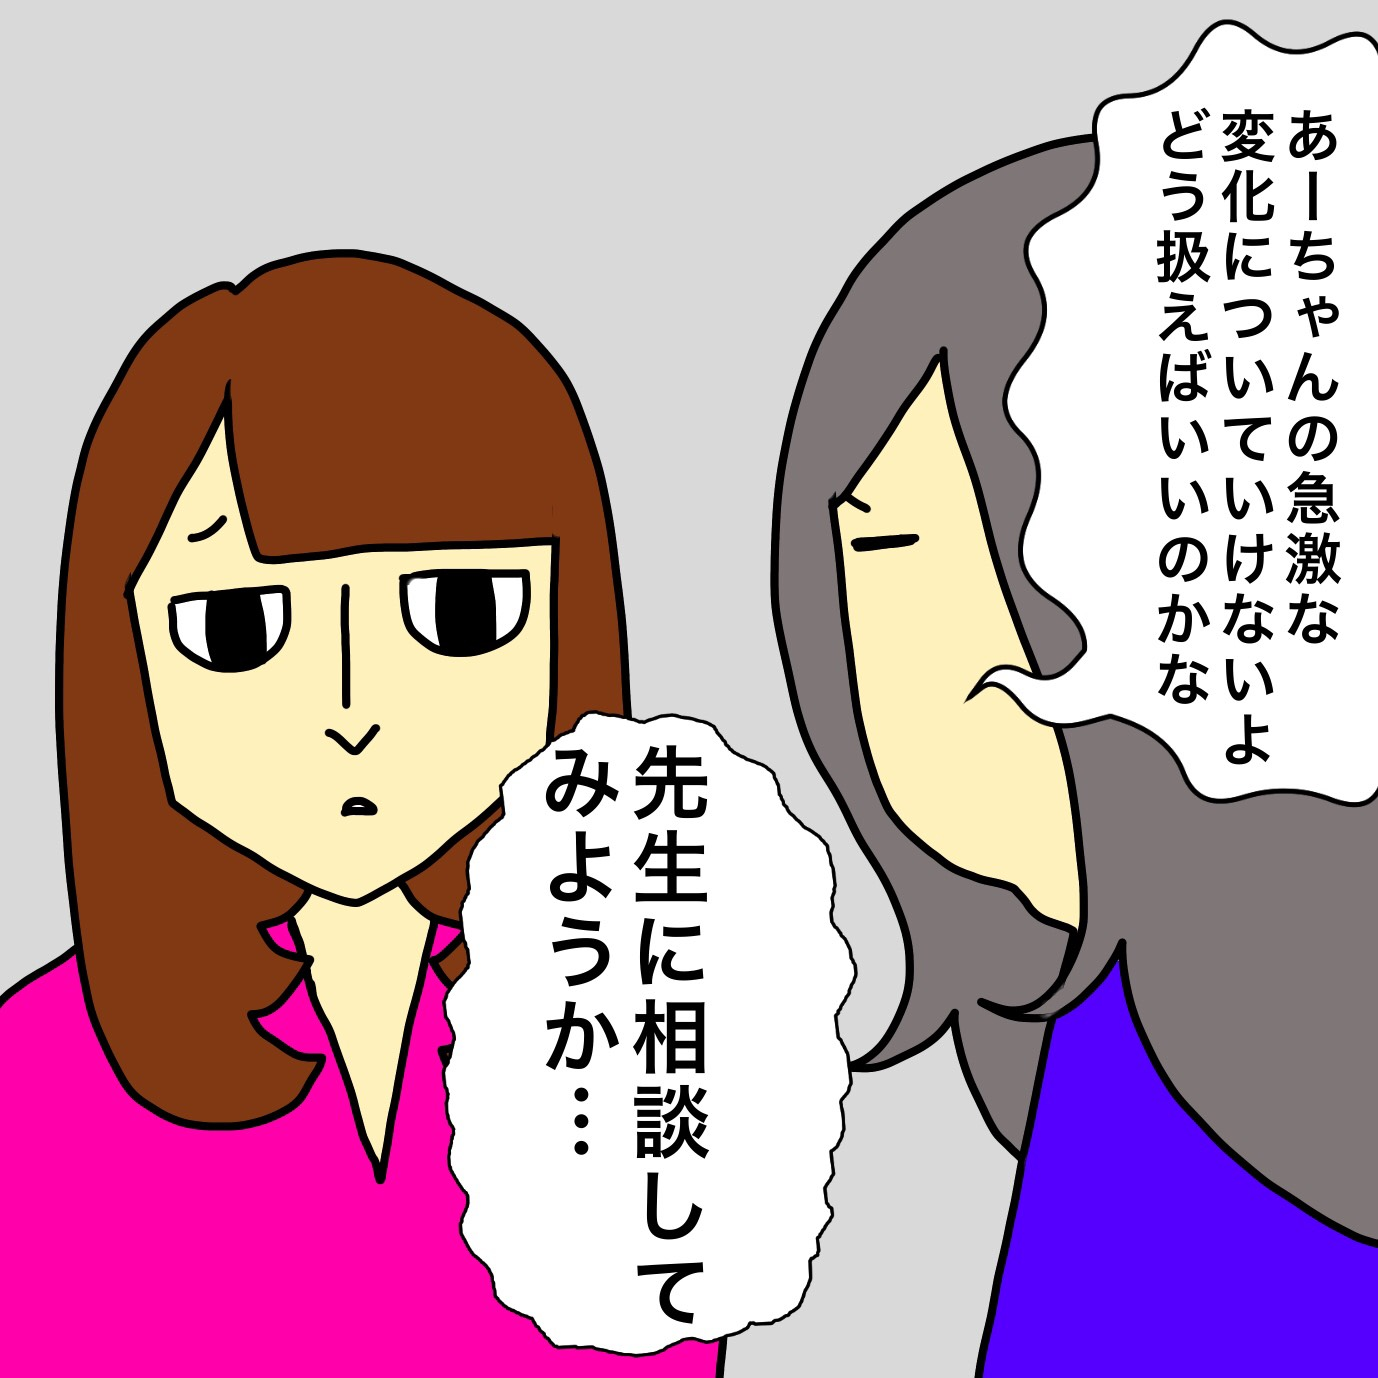 Image-3.jpeg